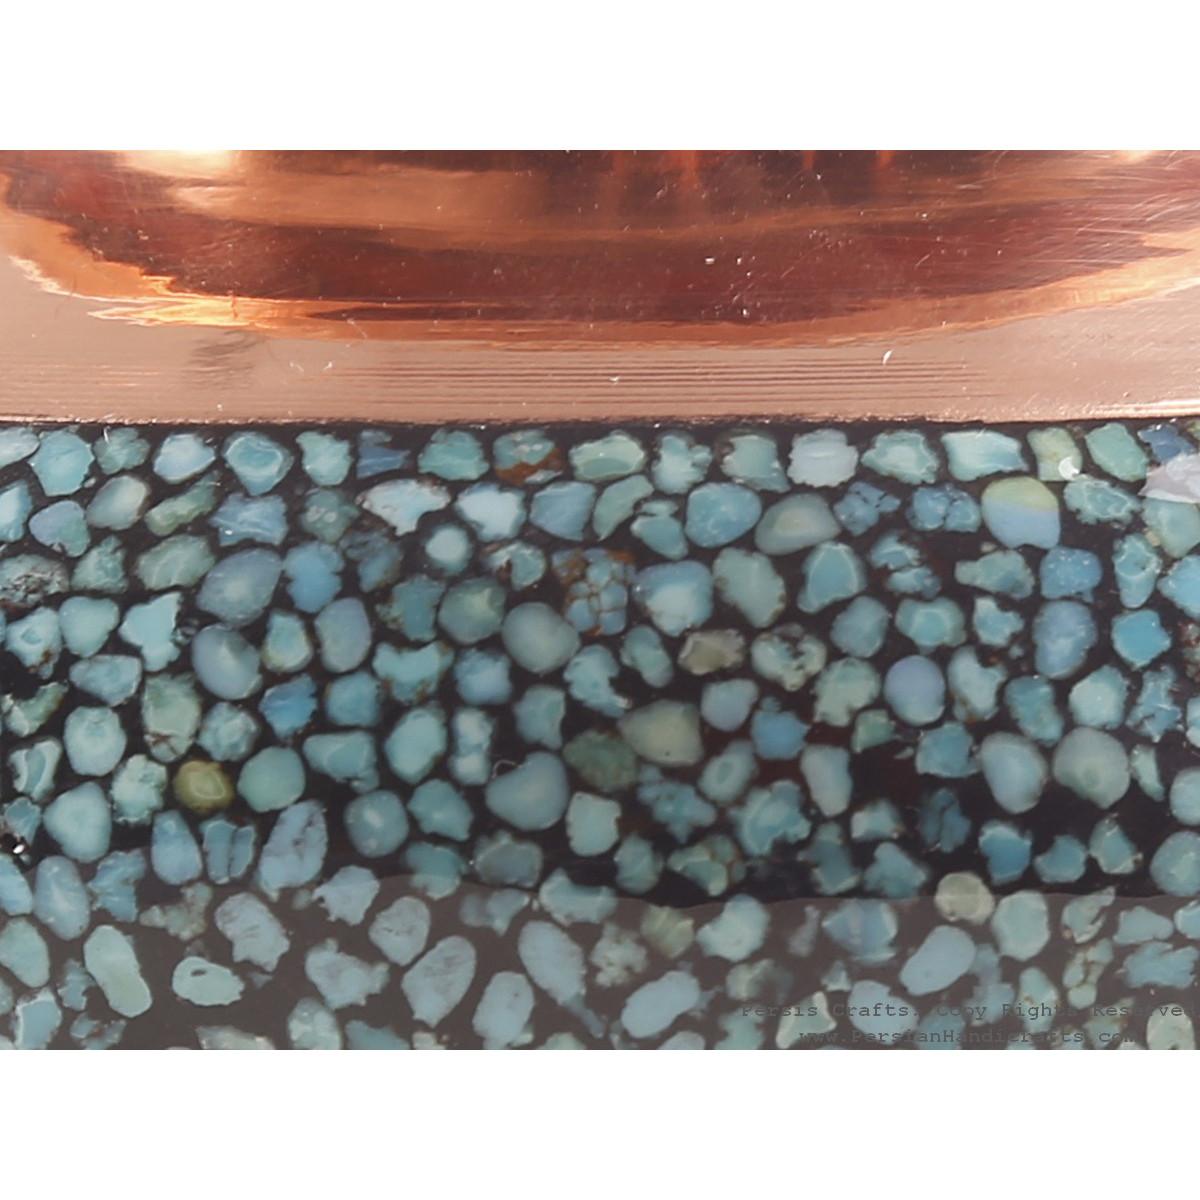 Turquoise Inlaying (FiroozehKoobi) Sugar/Candy Pot - HTI3002-Persian Handicrafts